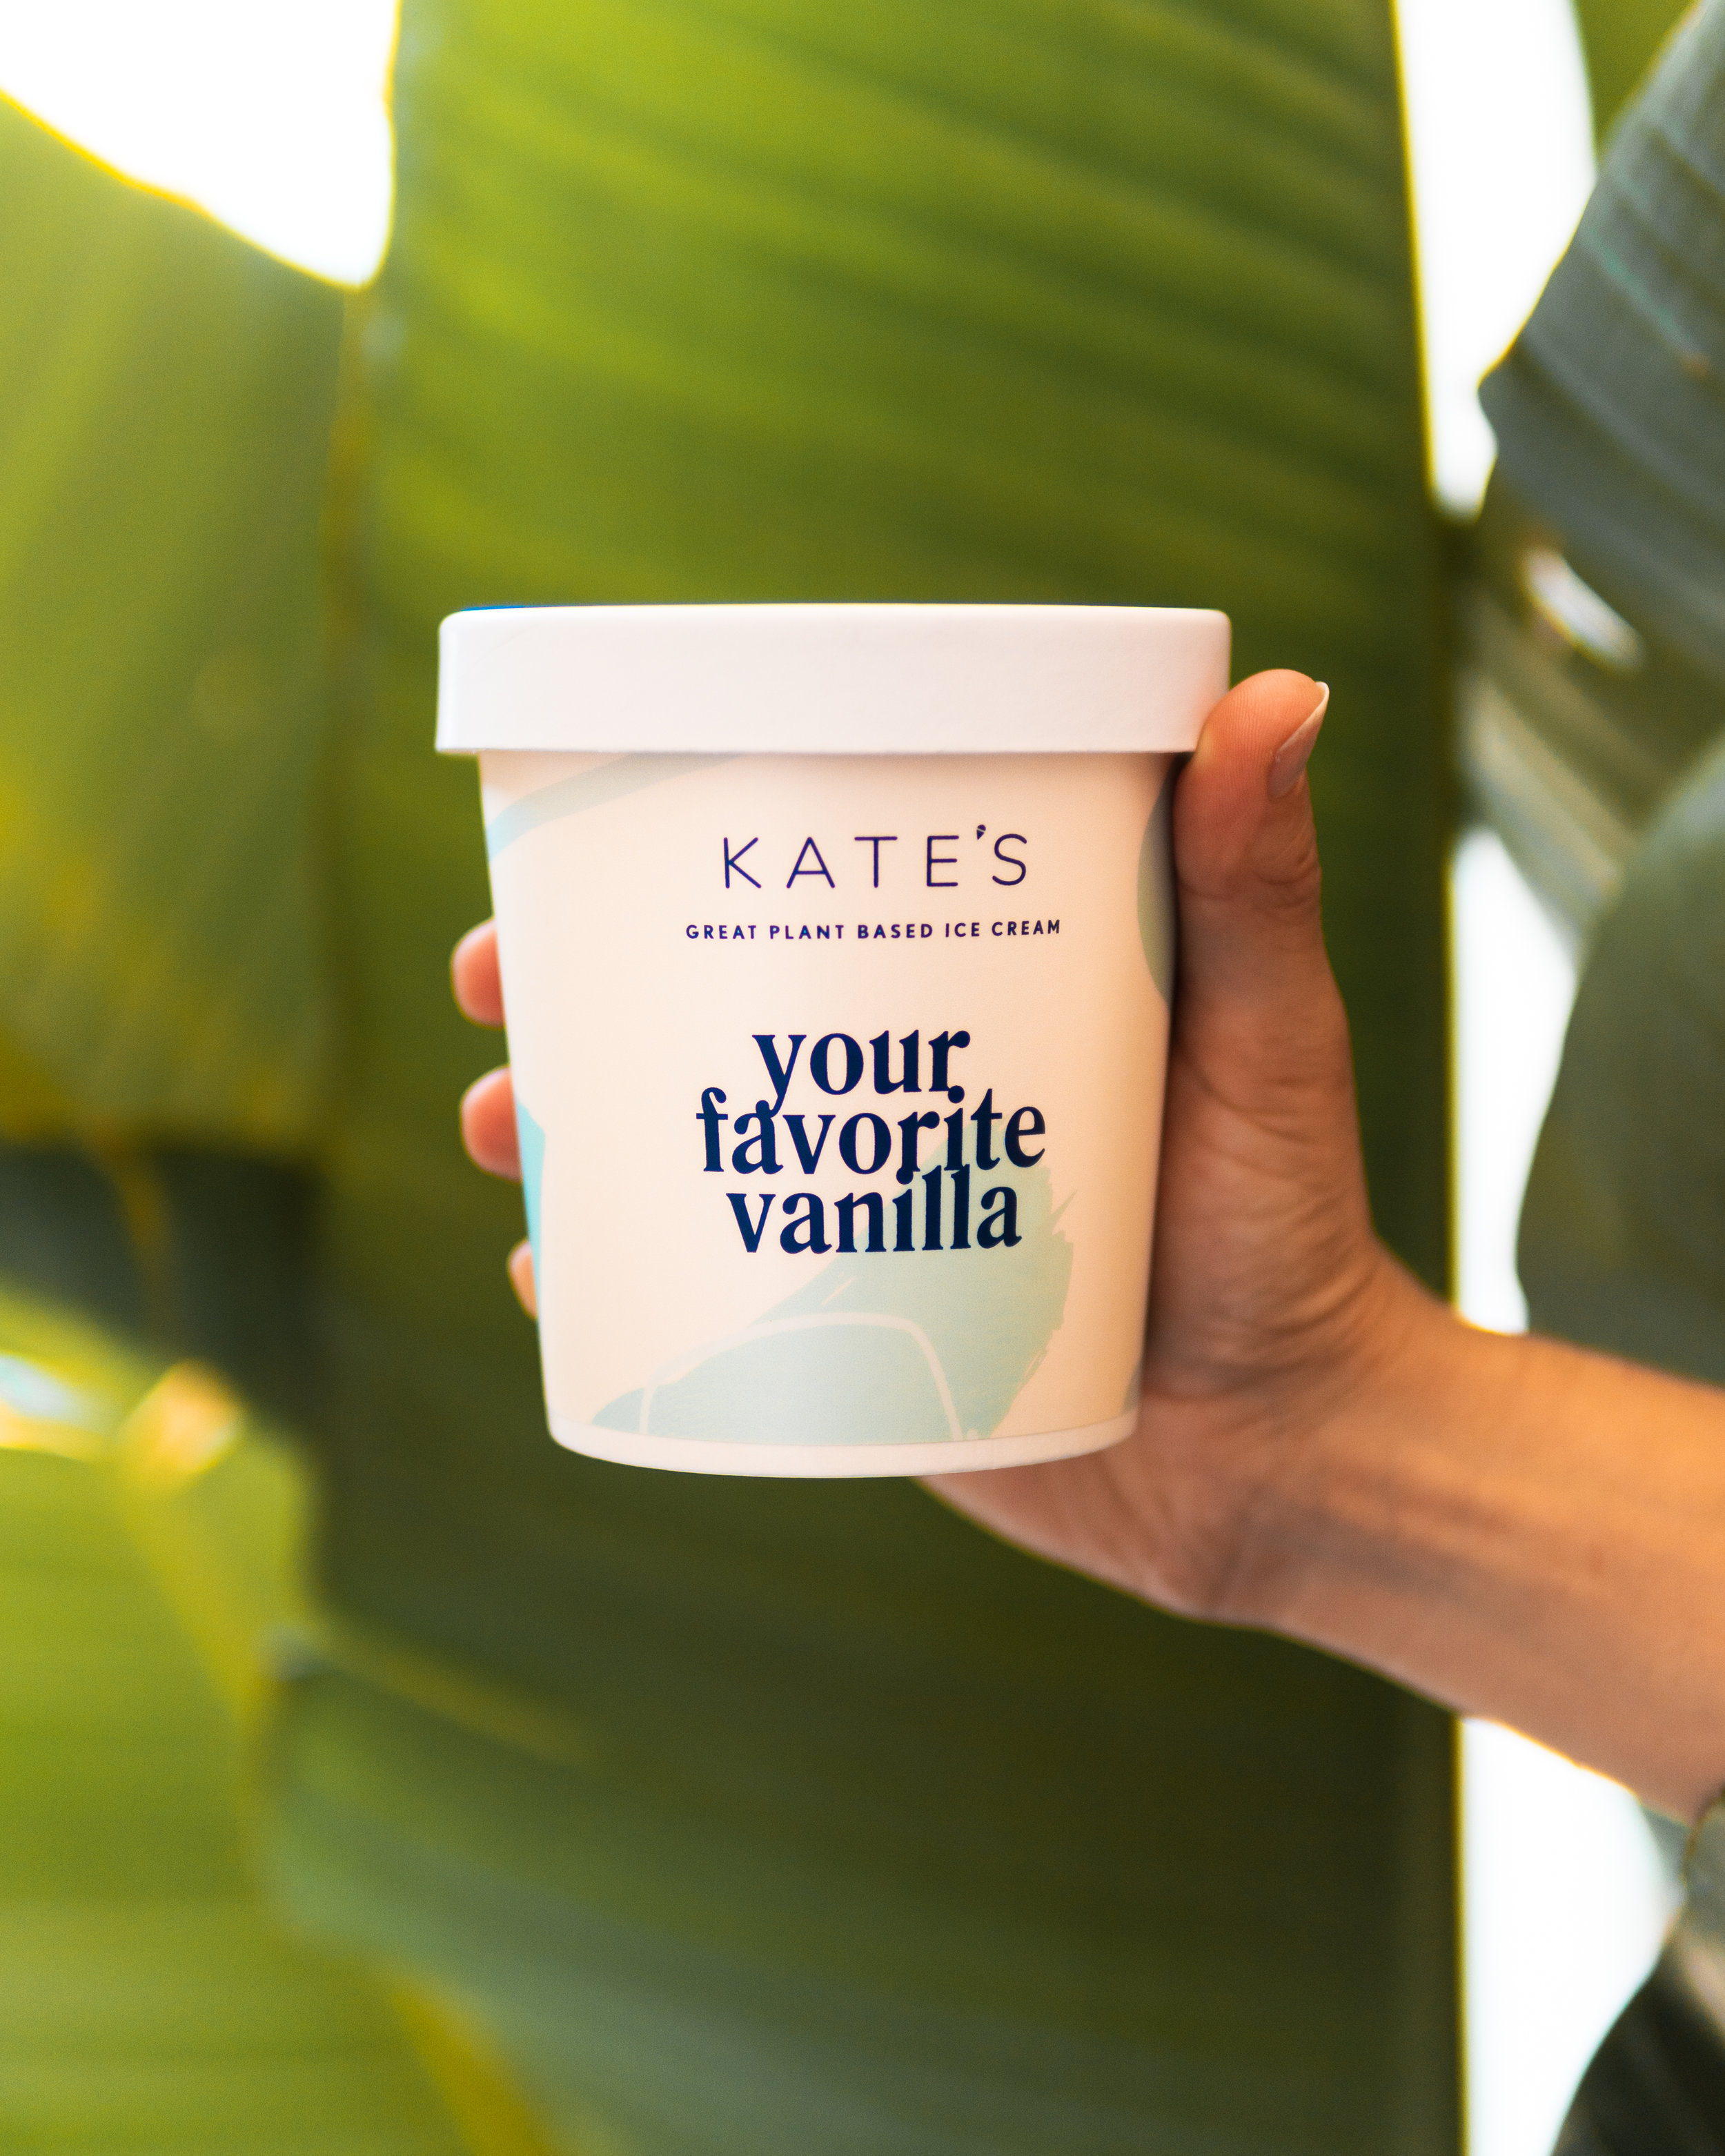 *coconut cream, cashew milk, *cane sugar, tapioca syrup, *vanilla extract, *olive oil, vanilla beans, sea salt, sunflower lecithin, nutritional yeast, guar gum.  contains: coconut, cashew  *organic ingredient